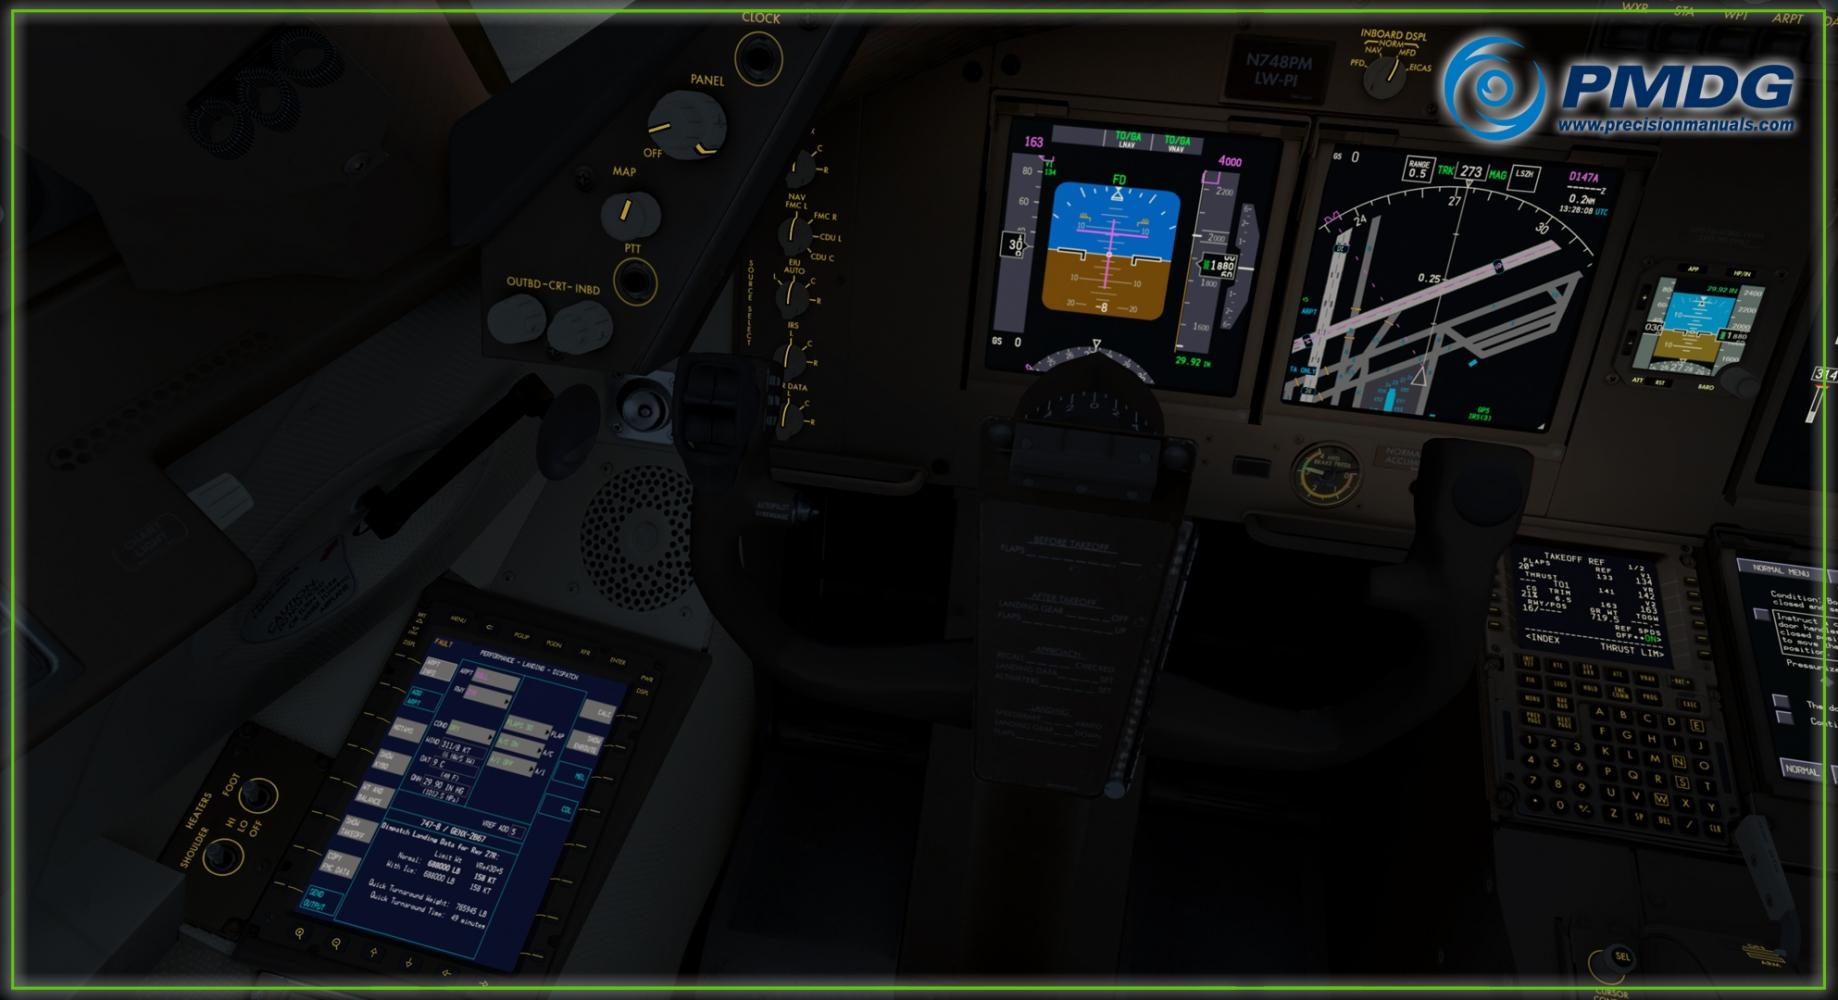 PMDG_748_EFB_Calculator.jpg